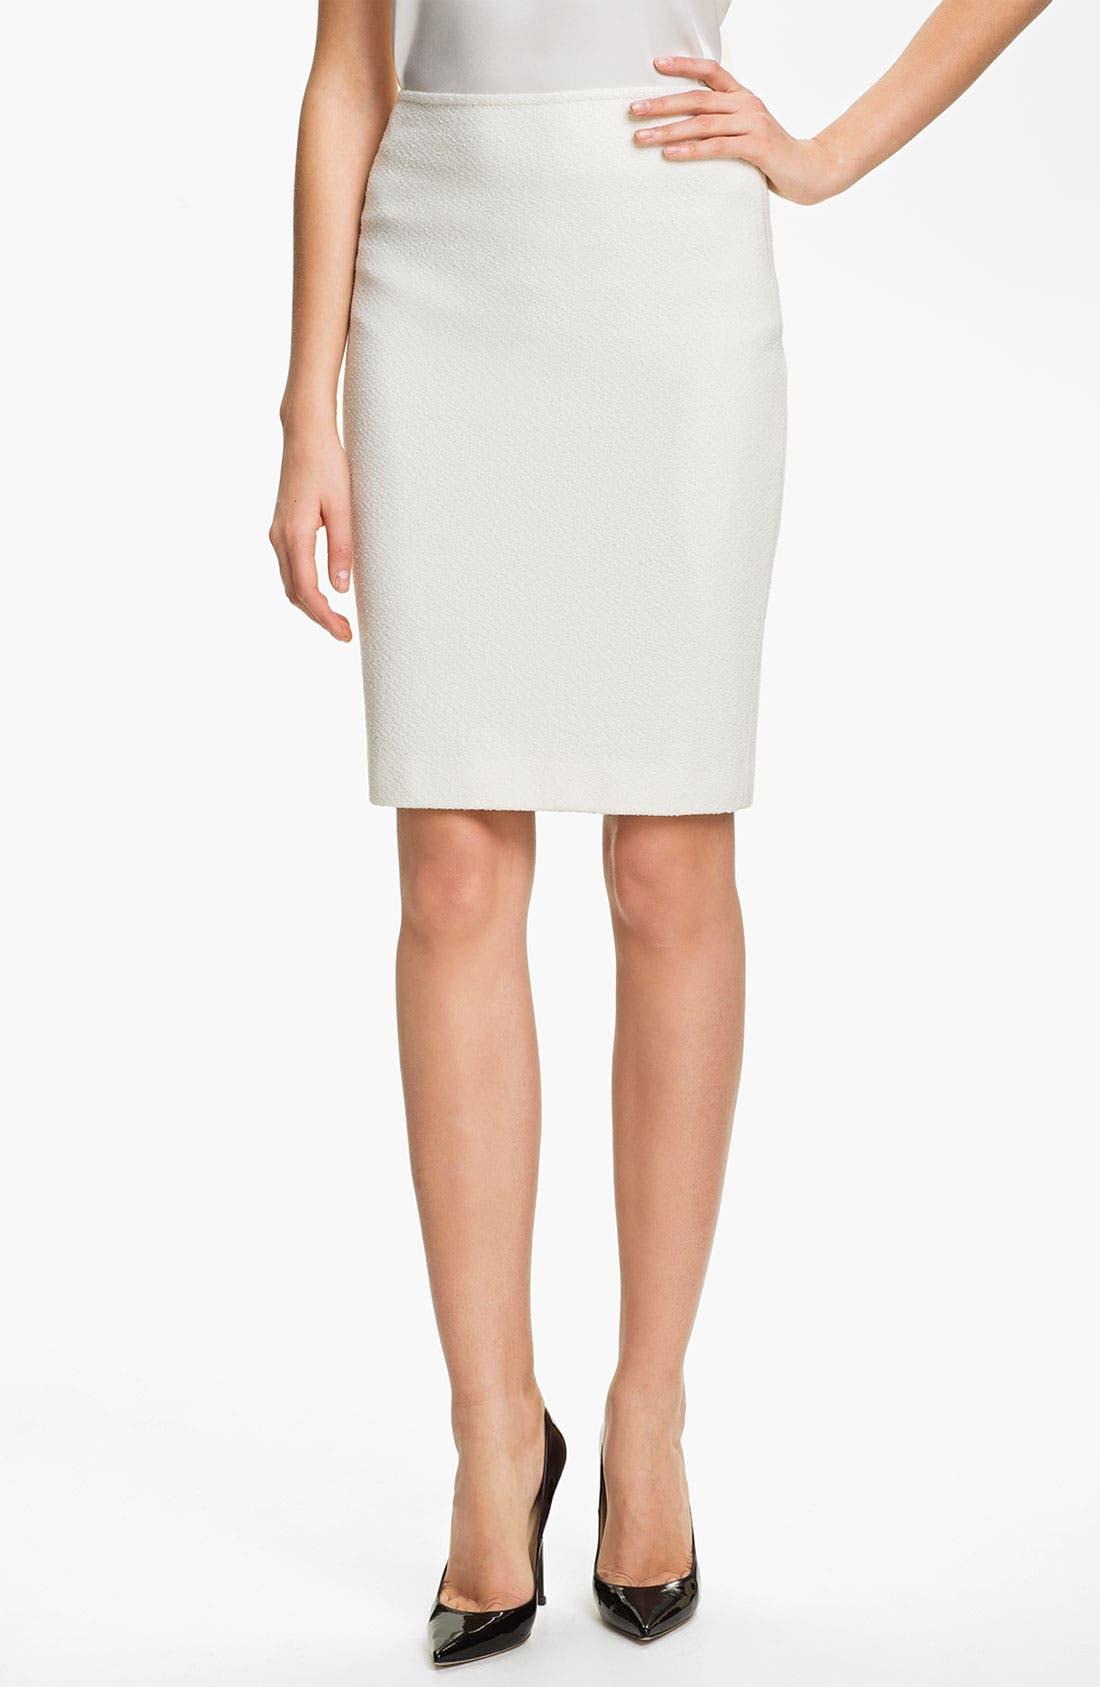 Alternate Image 1 Selected - St. John Collection Cosmopolitan Tweed Pencil Skirt